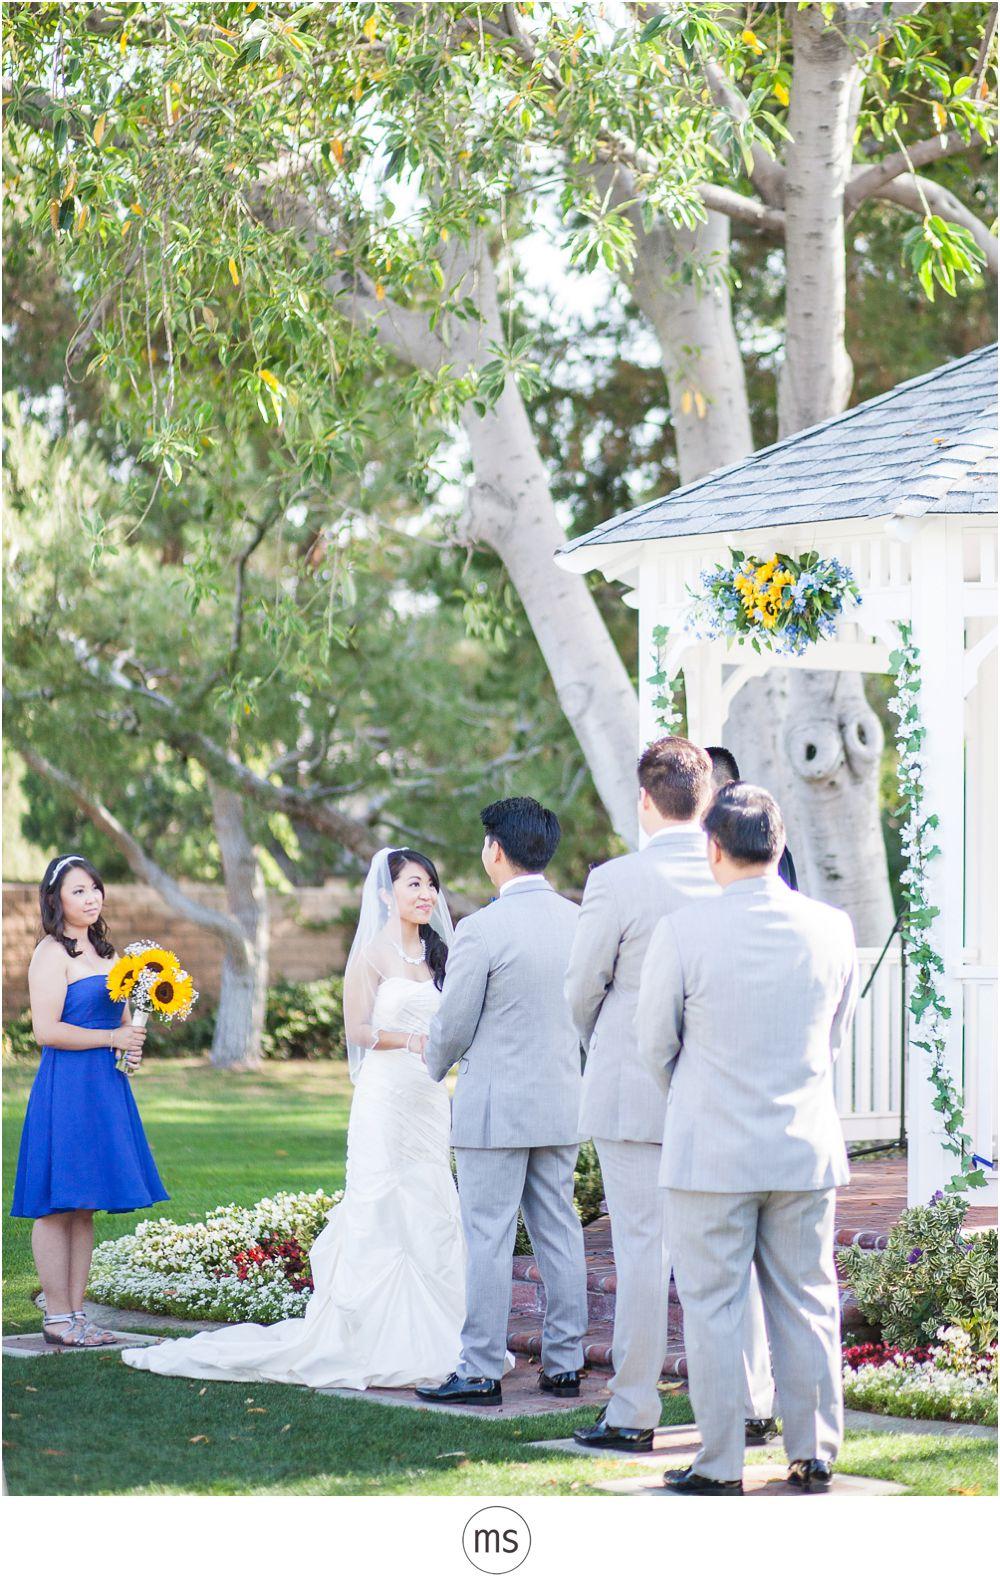 Charles & Sarah Alta Vista Country Club Placentia Wedding - Margarette Sia Photography_0057